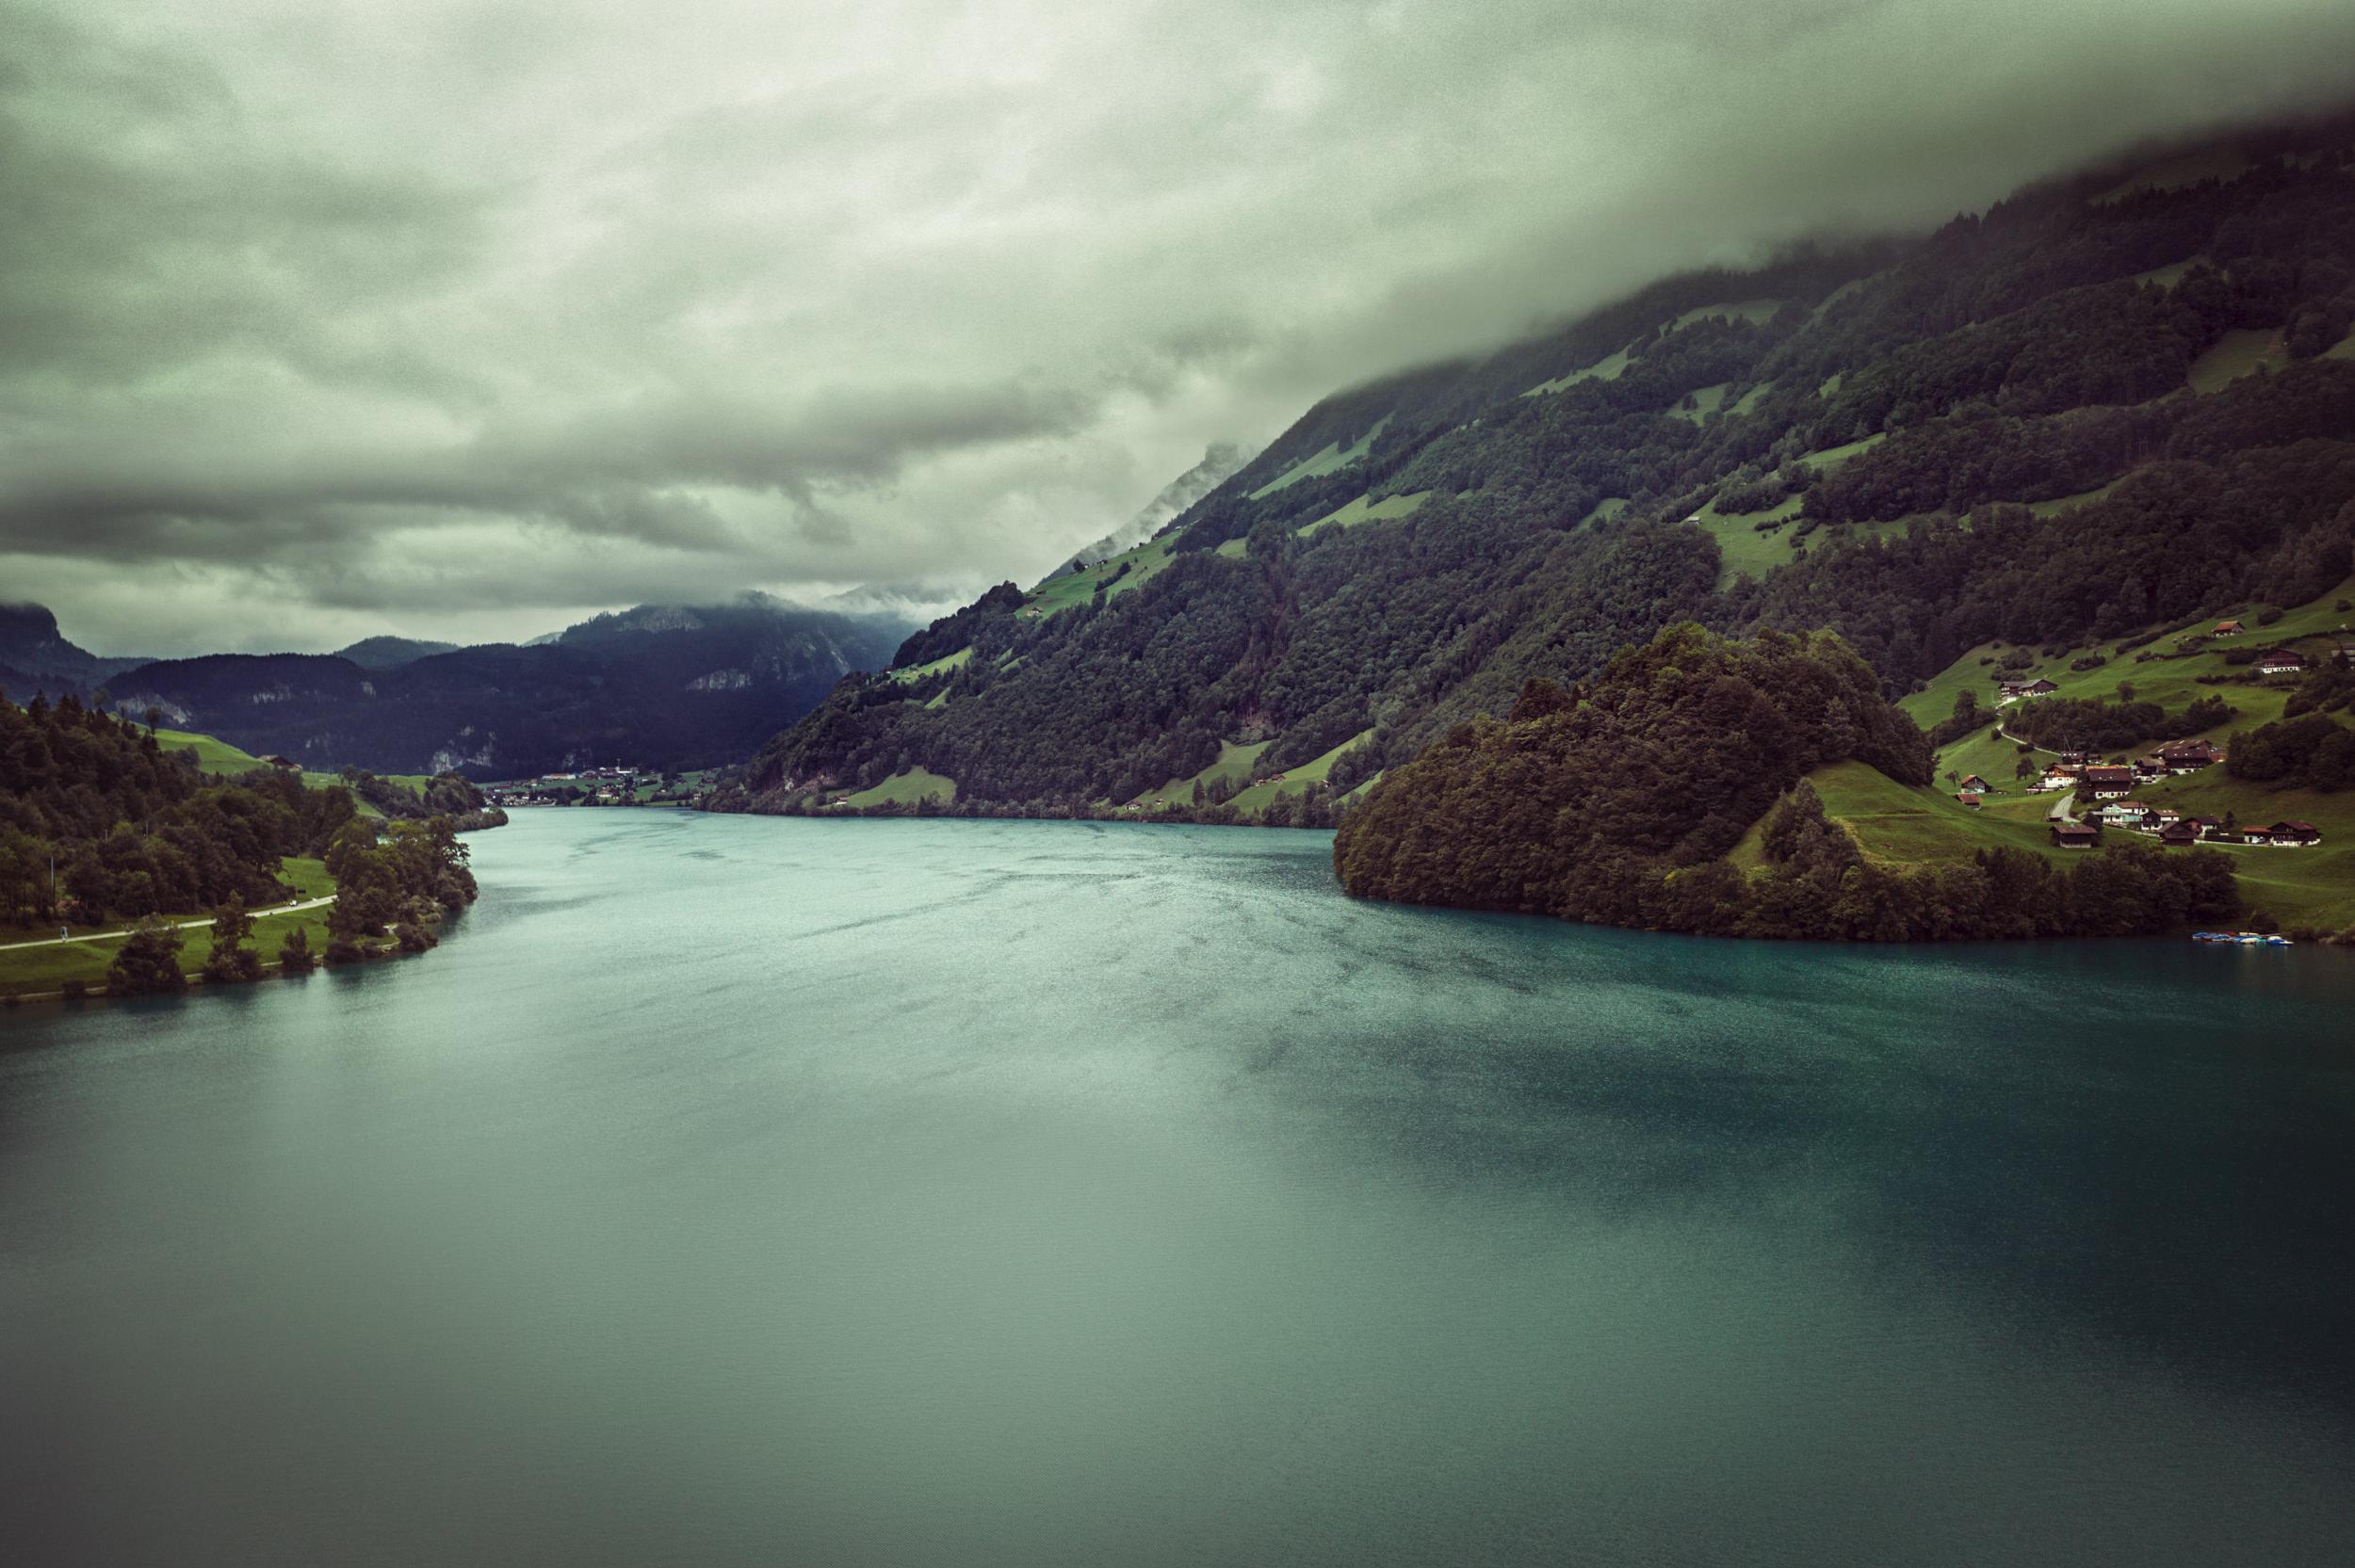 Landschaftsfotografie fotograf filmemacher frankfurt patrick schmetzer drohne landschaft natur 62